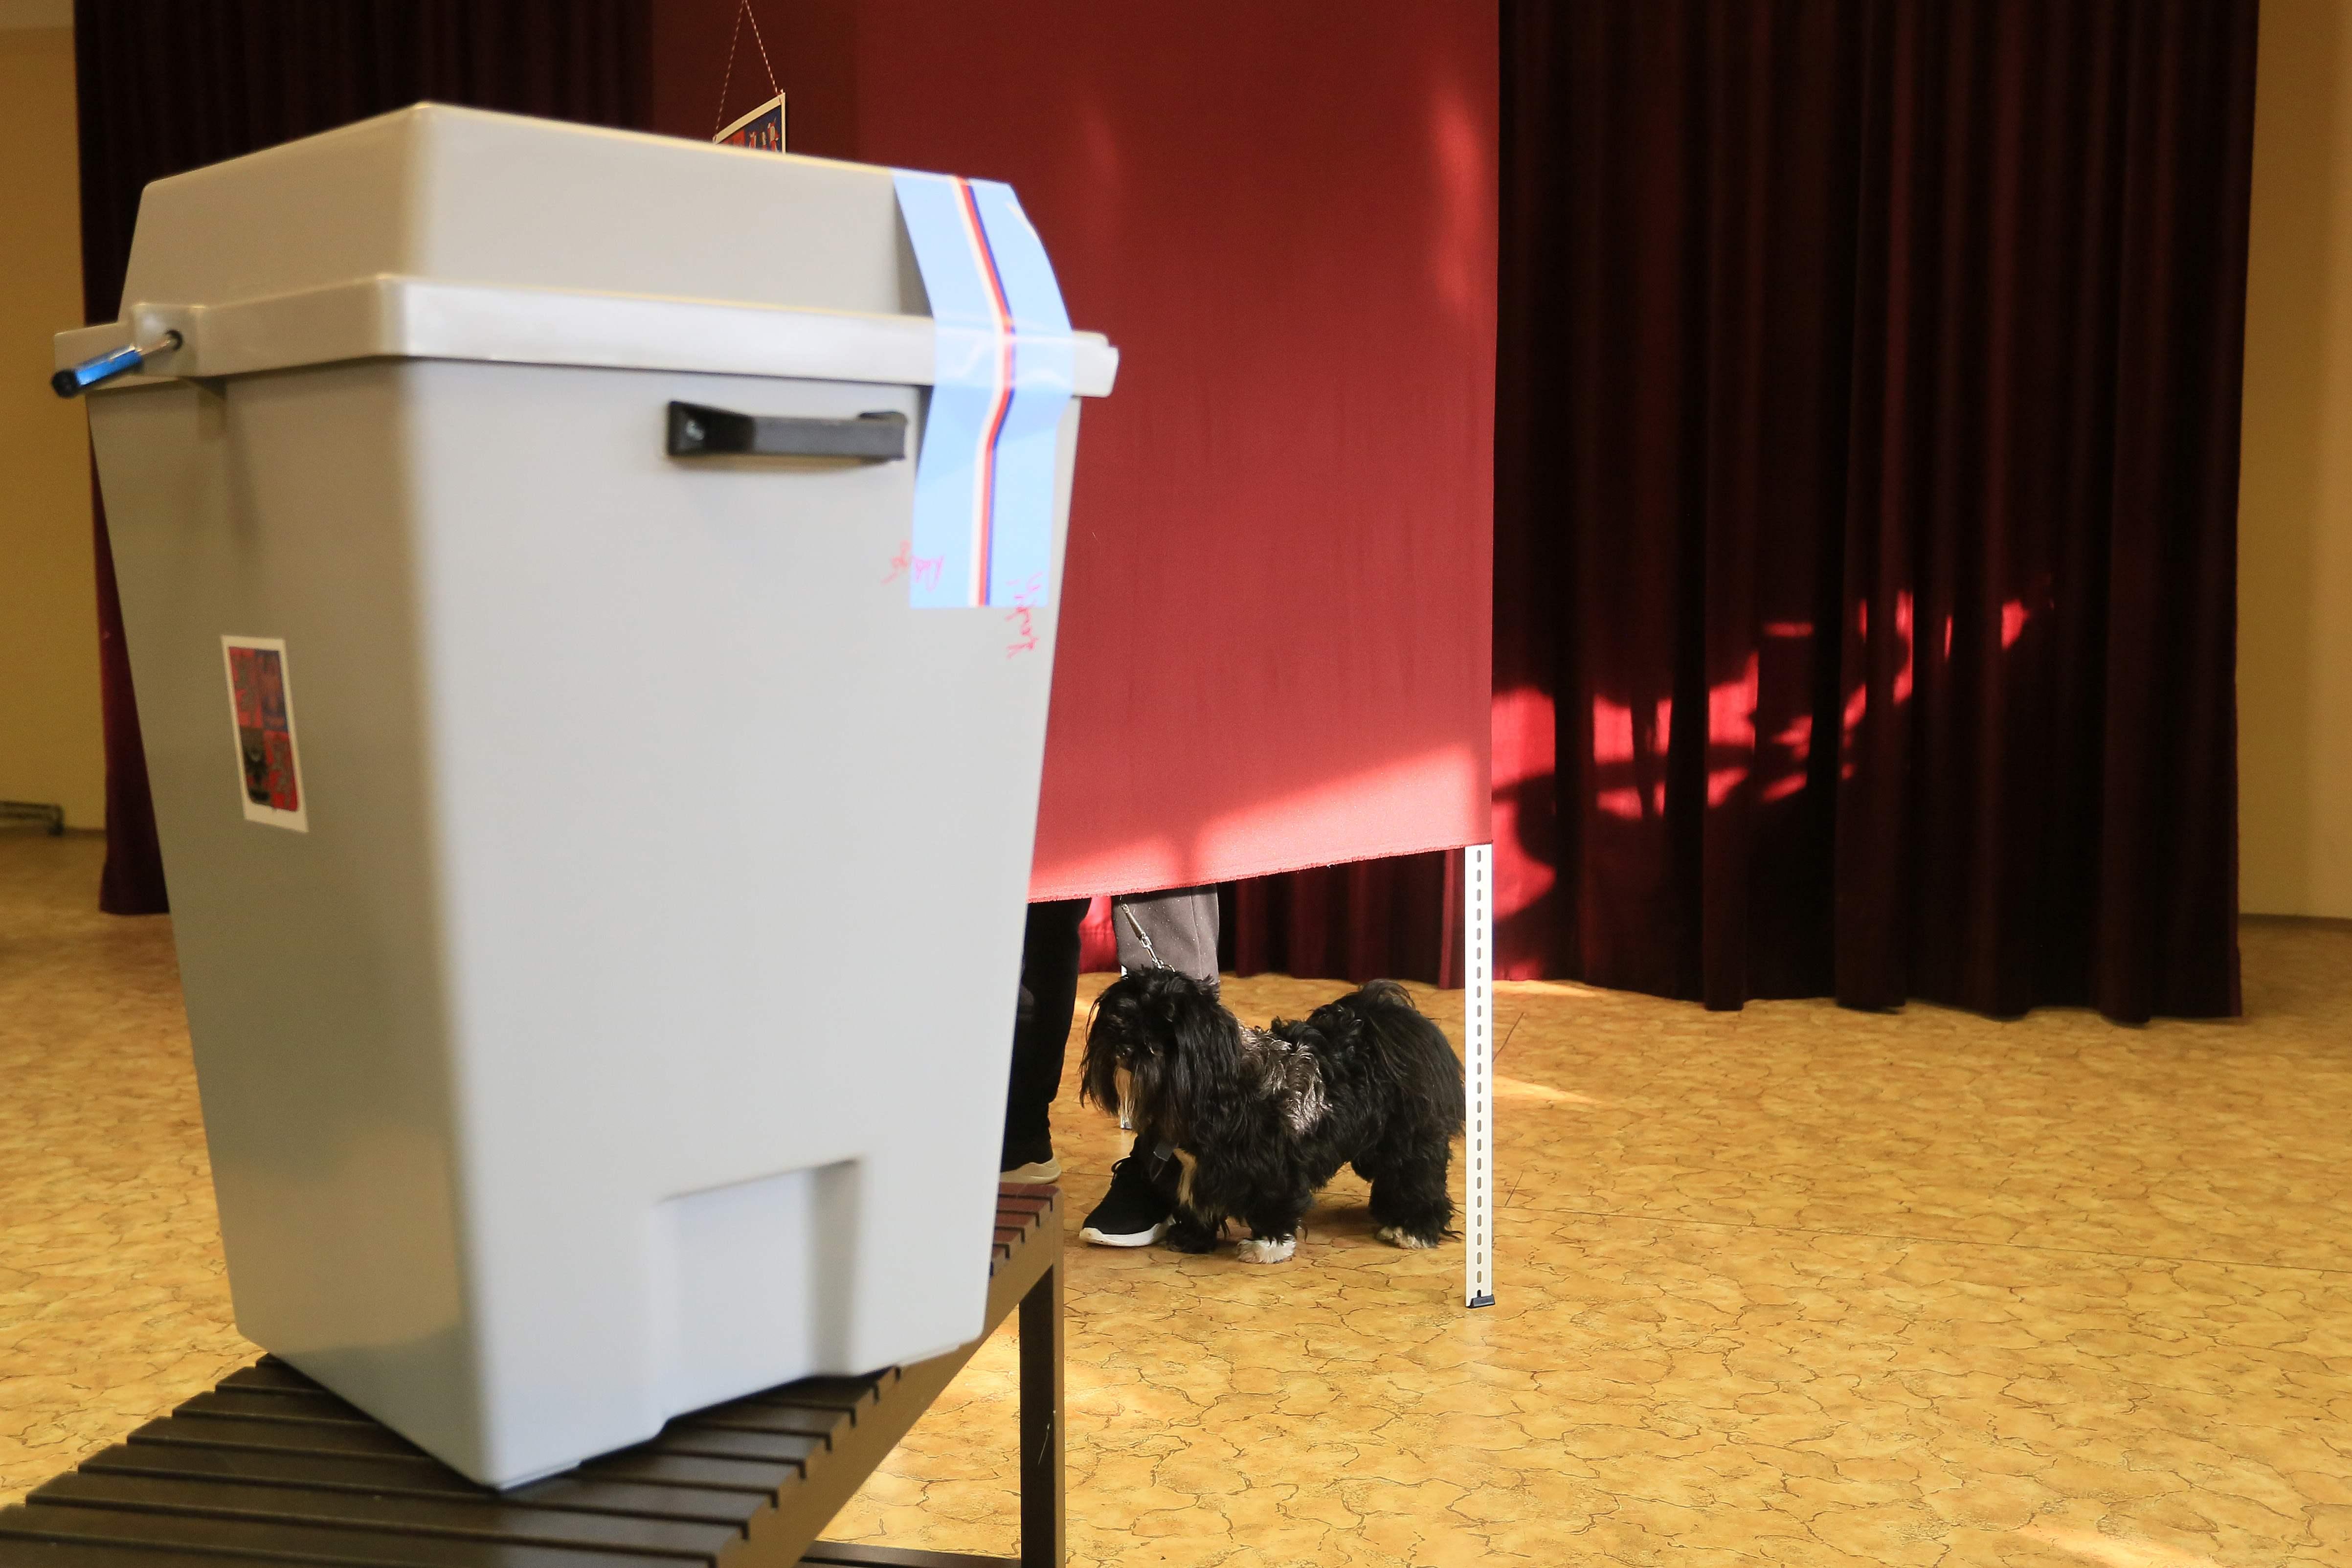 Milos Zeman eleito para novo mandato como Presidente da República Checa